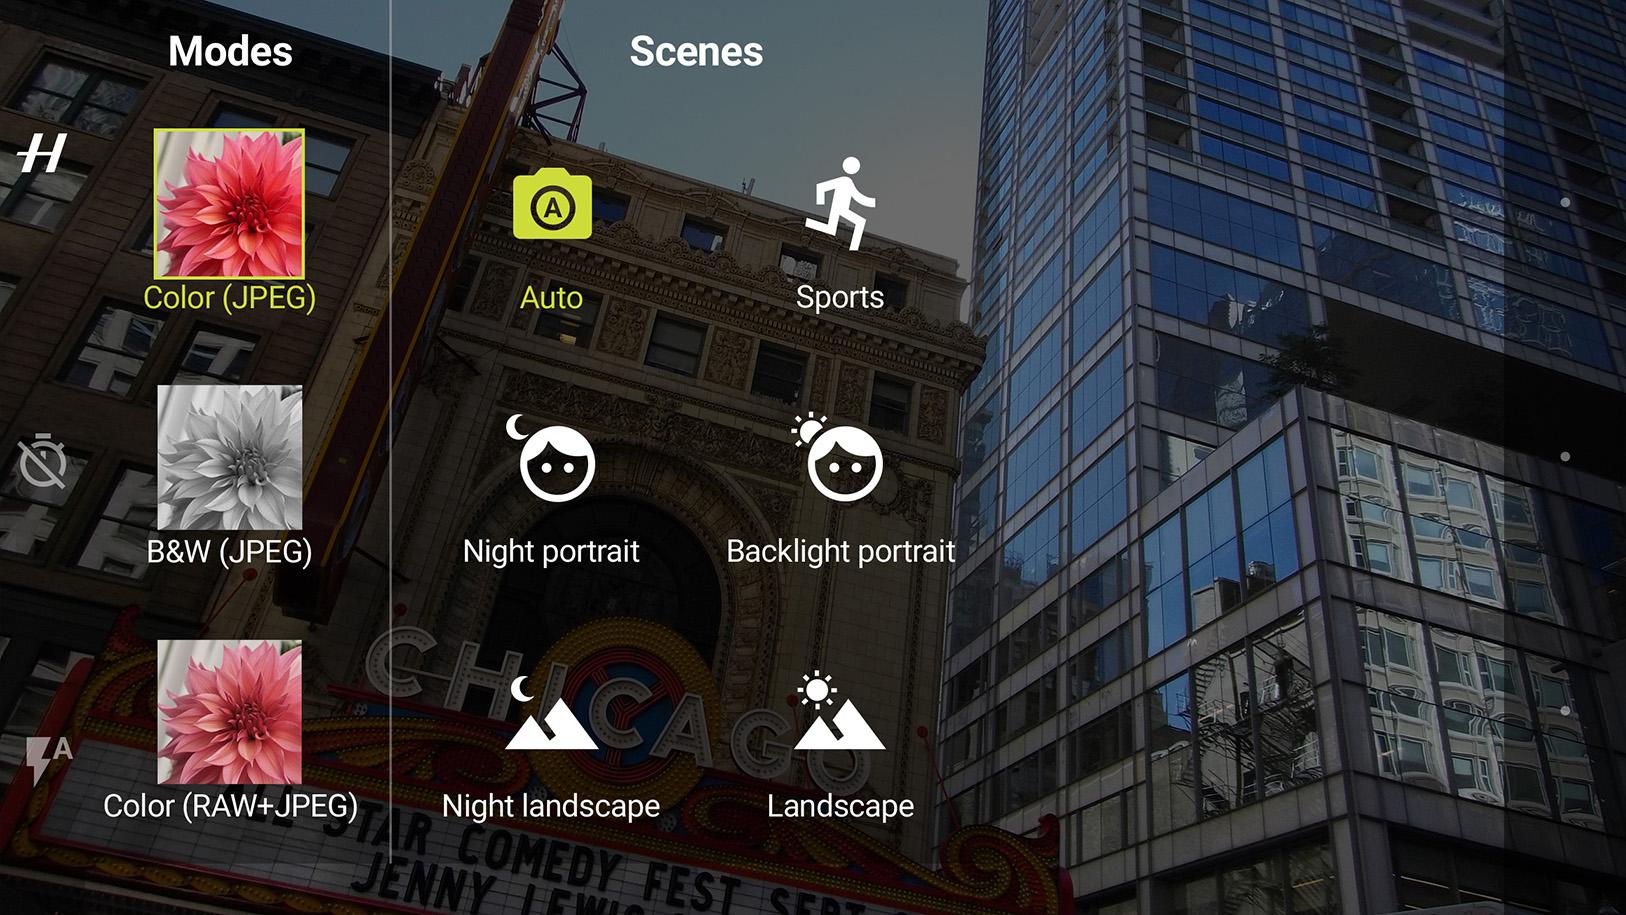 camera-modes-scenes-chicago